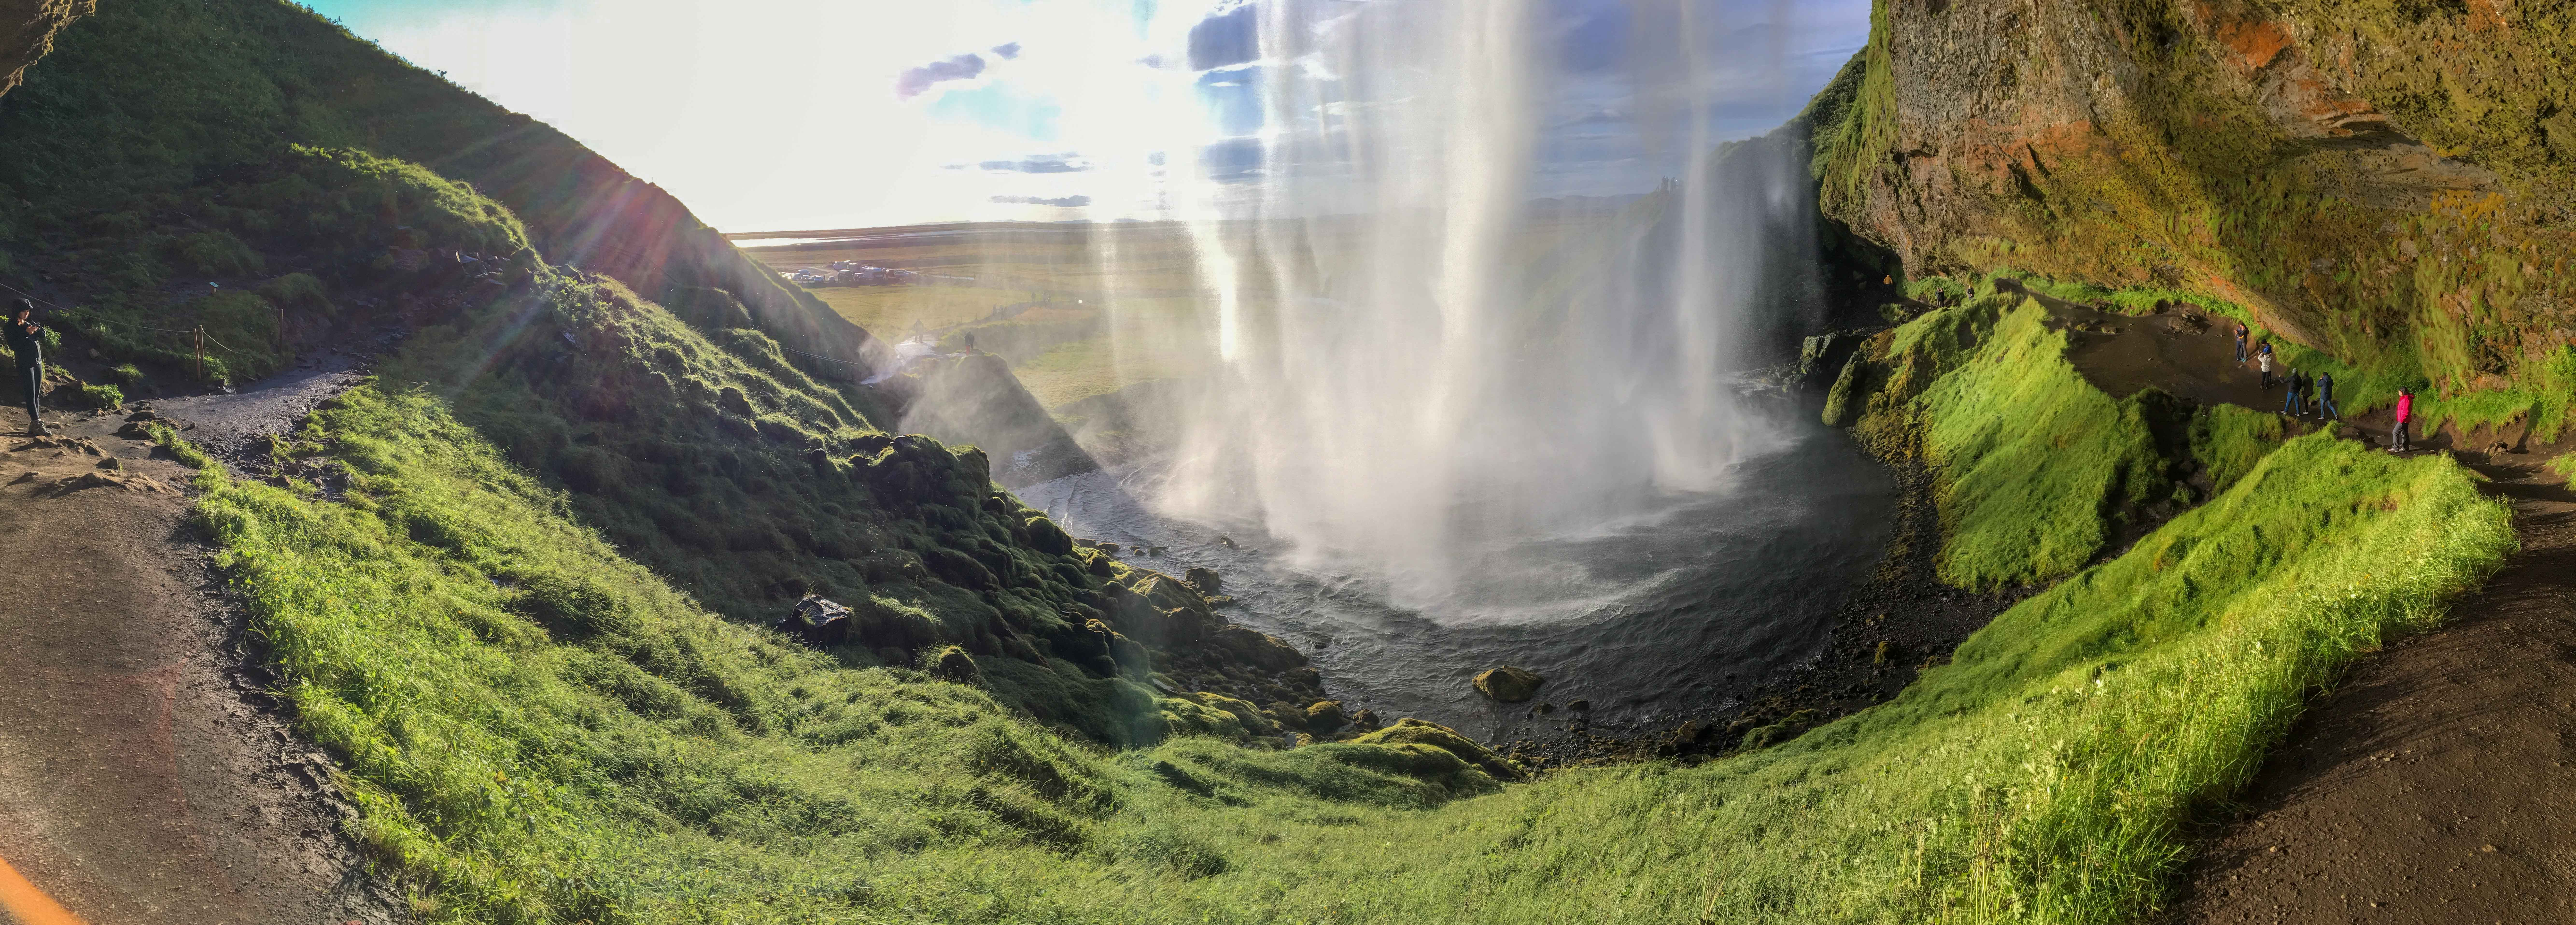 seljalandfoss panorama